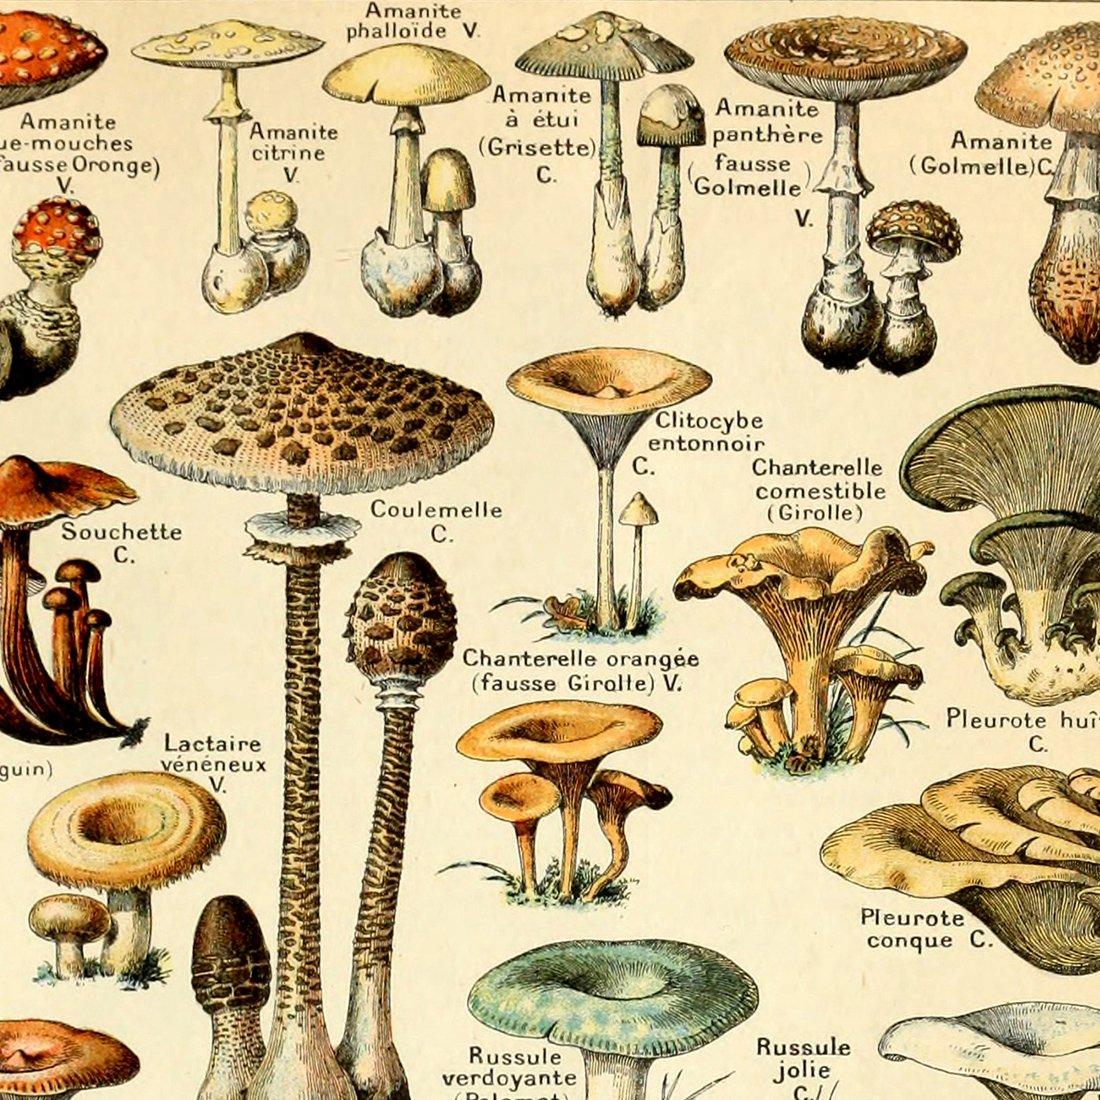 Amazon.com: Meishe Art Vintage Poster Print Mushrooms Champignons ...